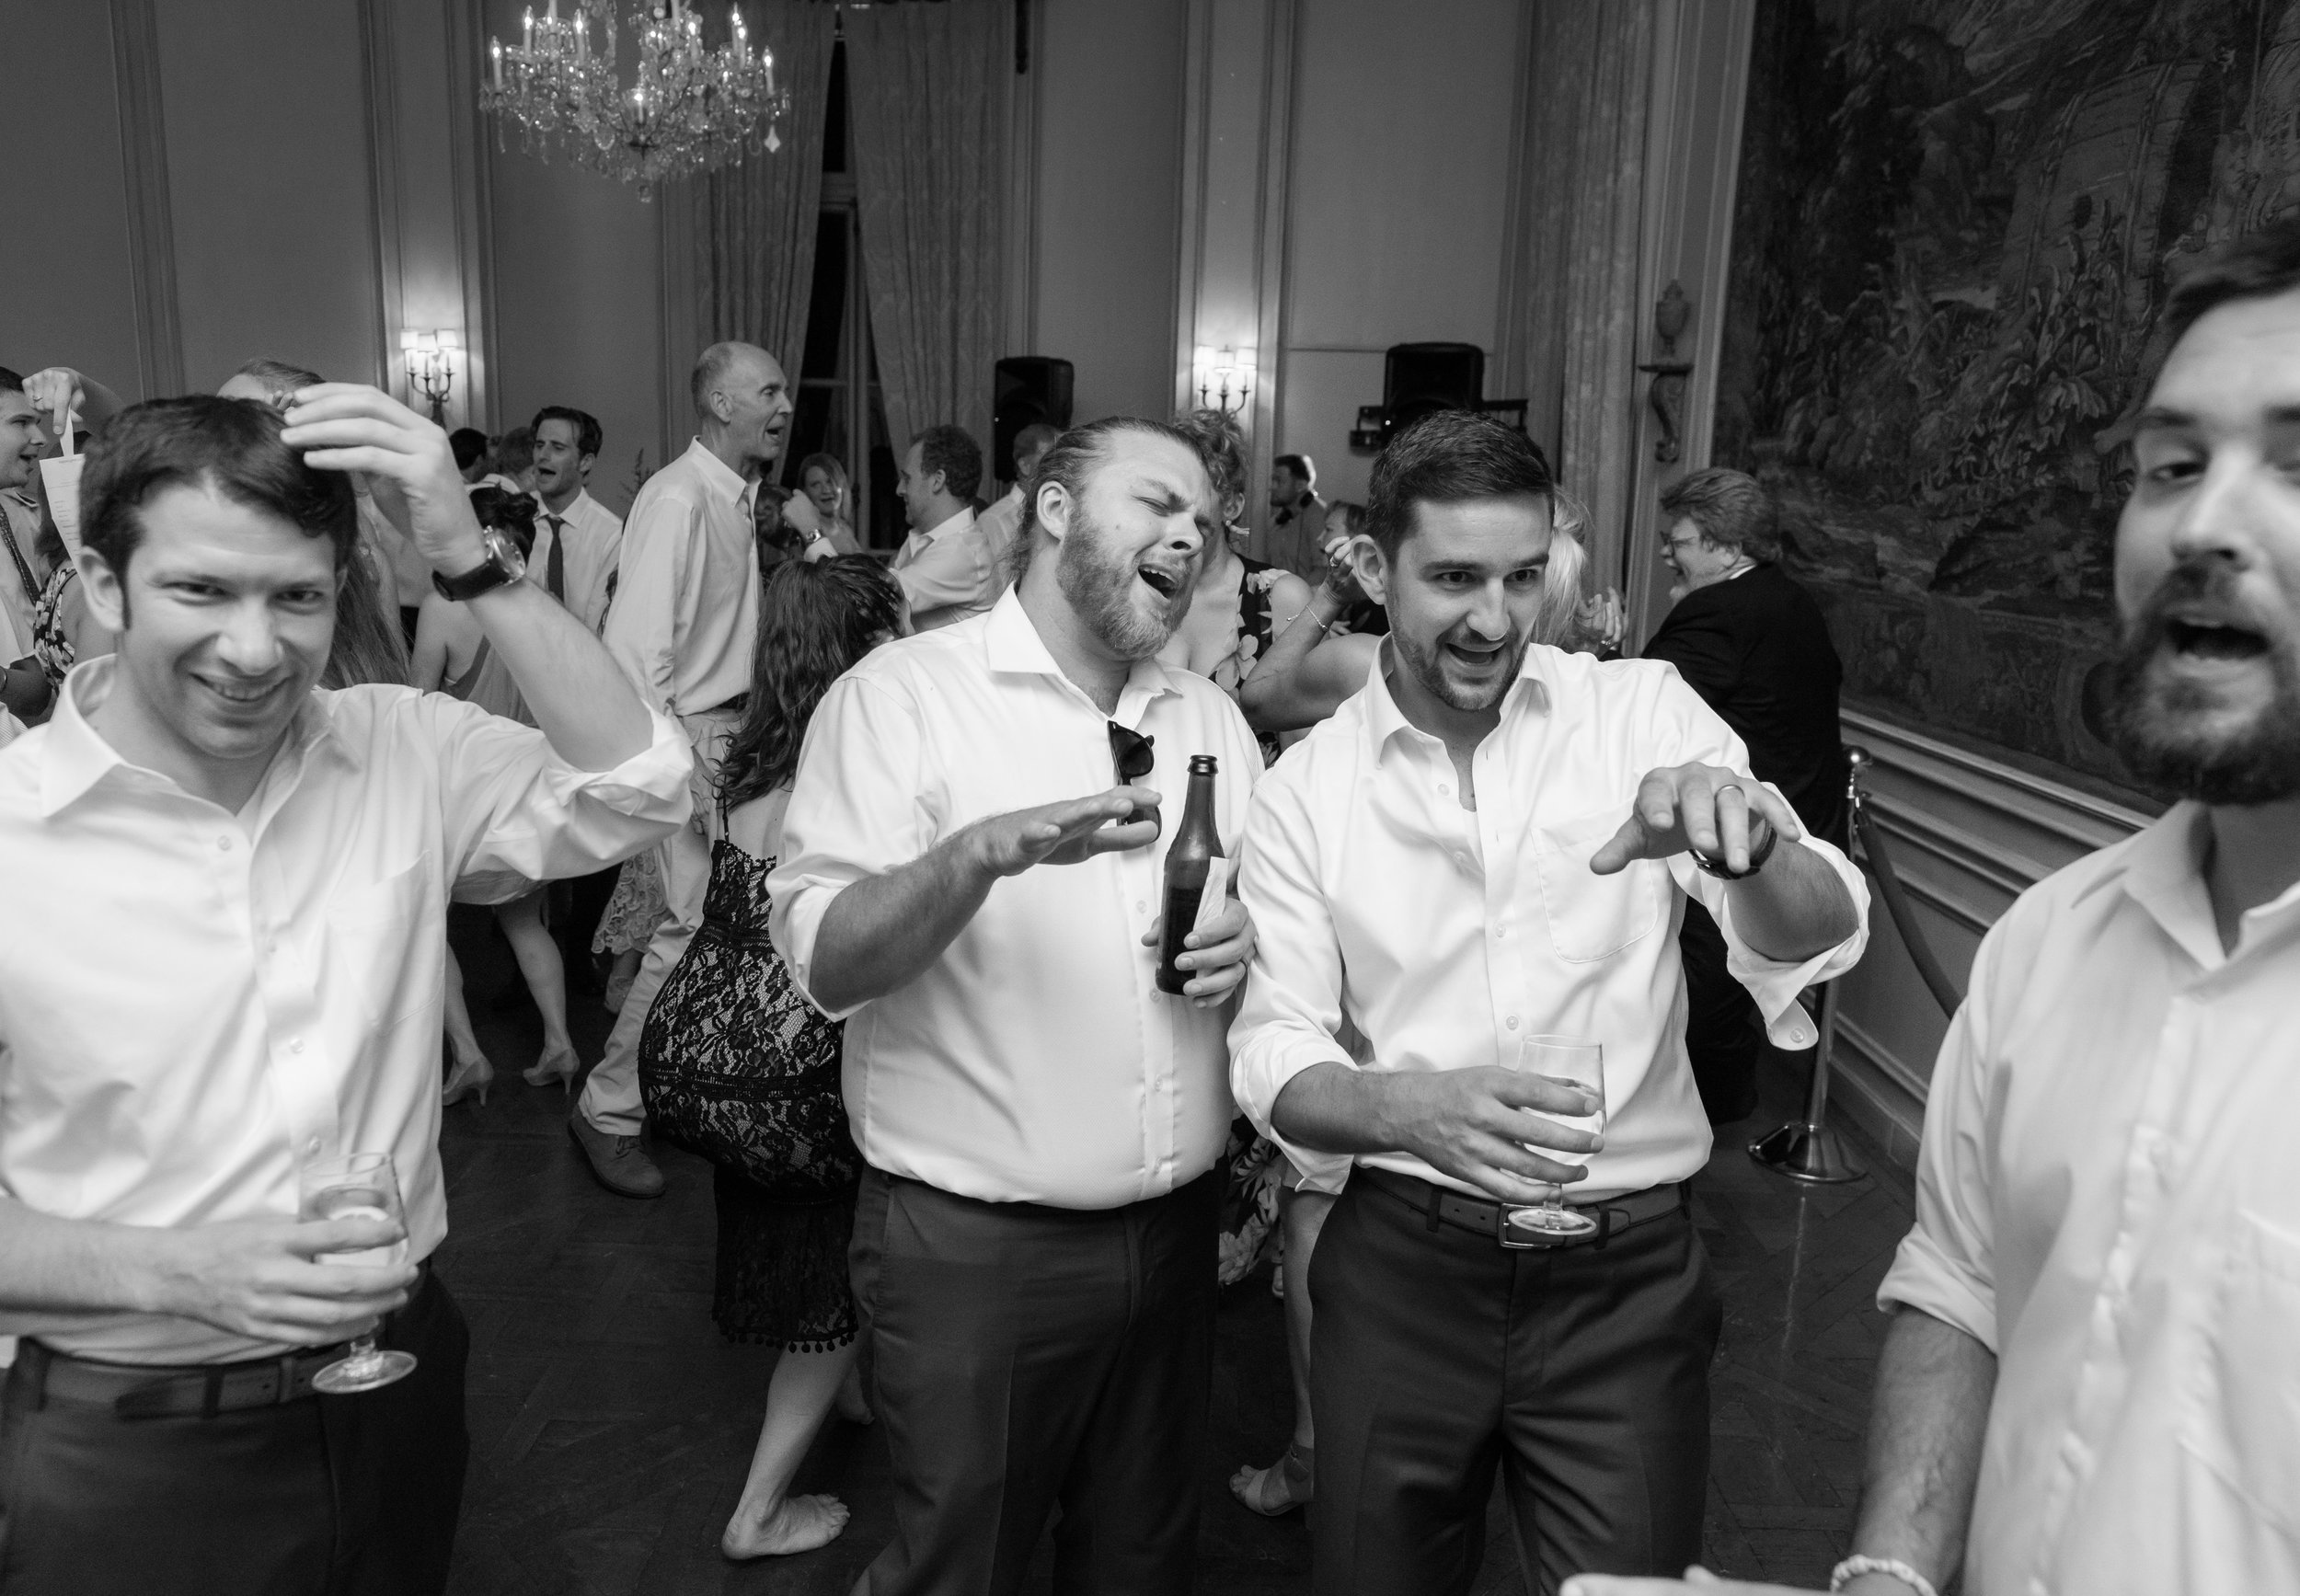 Groom and groomsmen at a washington dc wedding